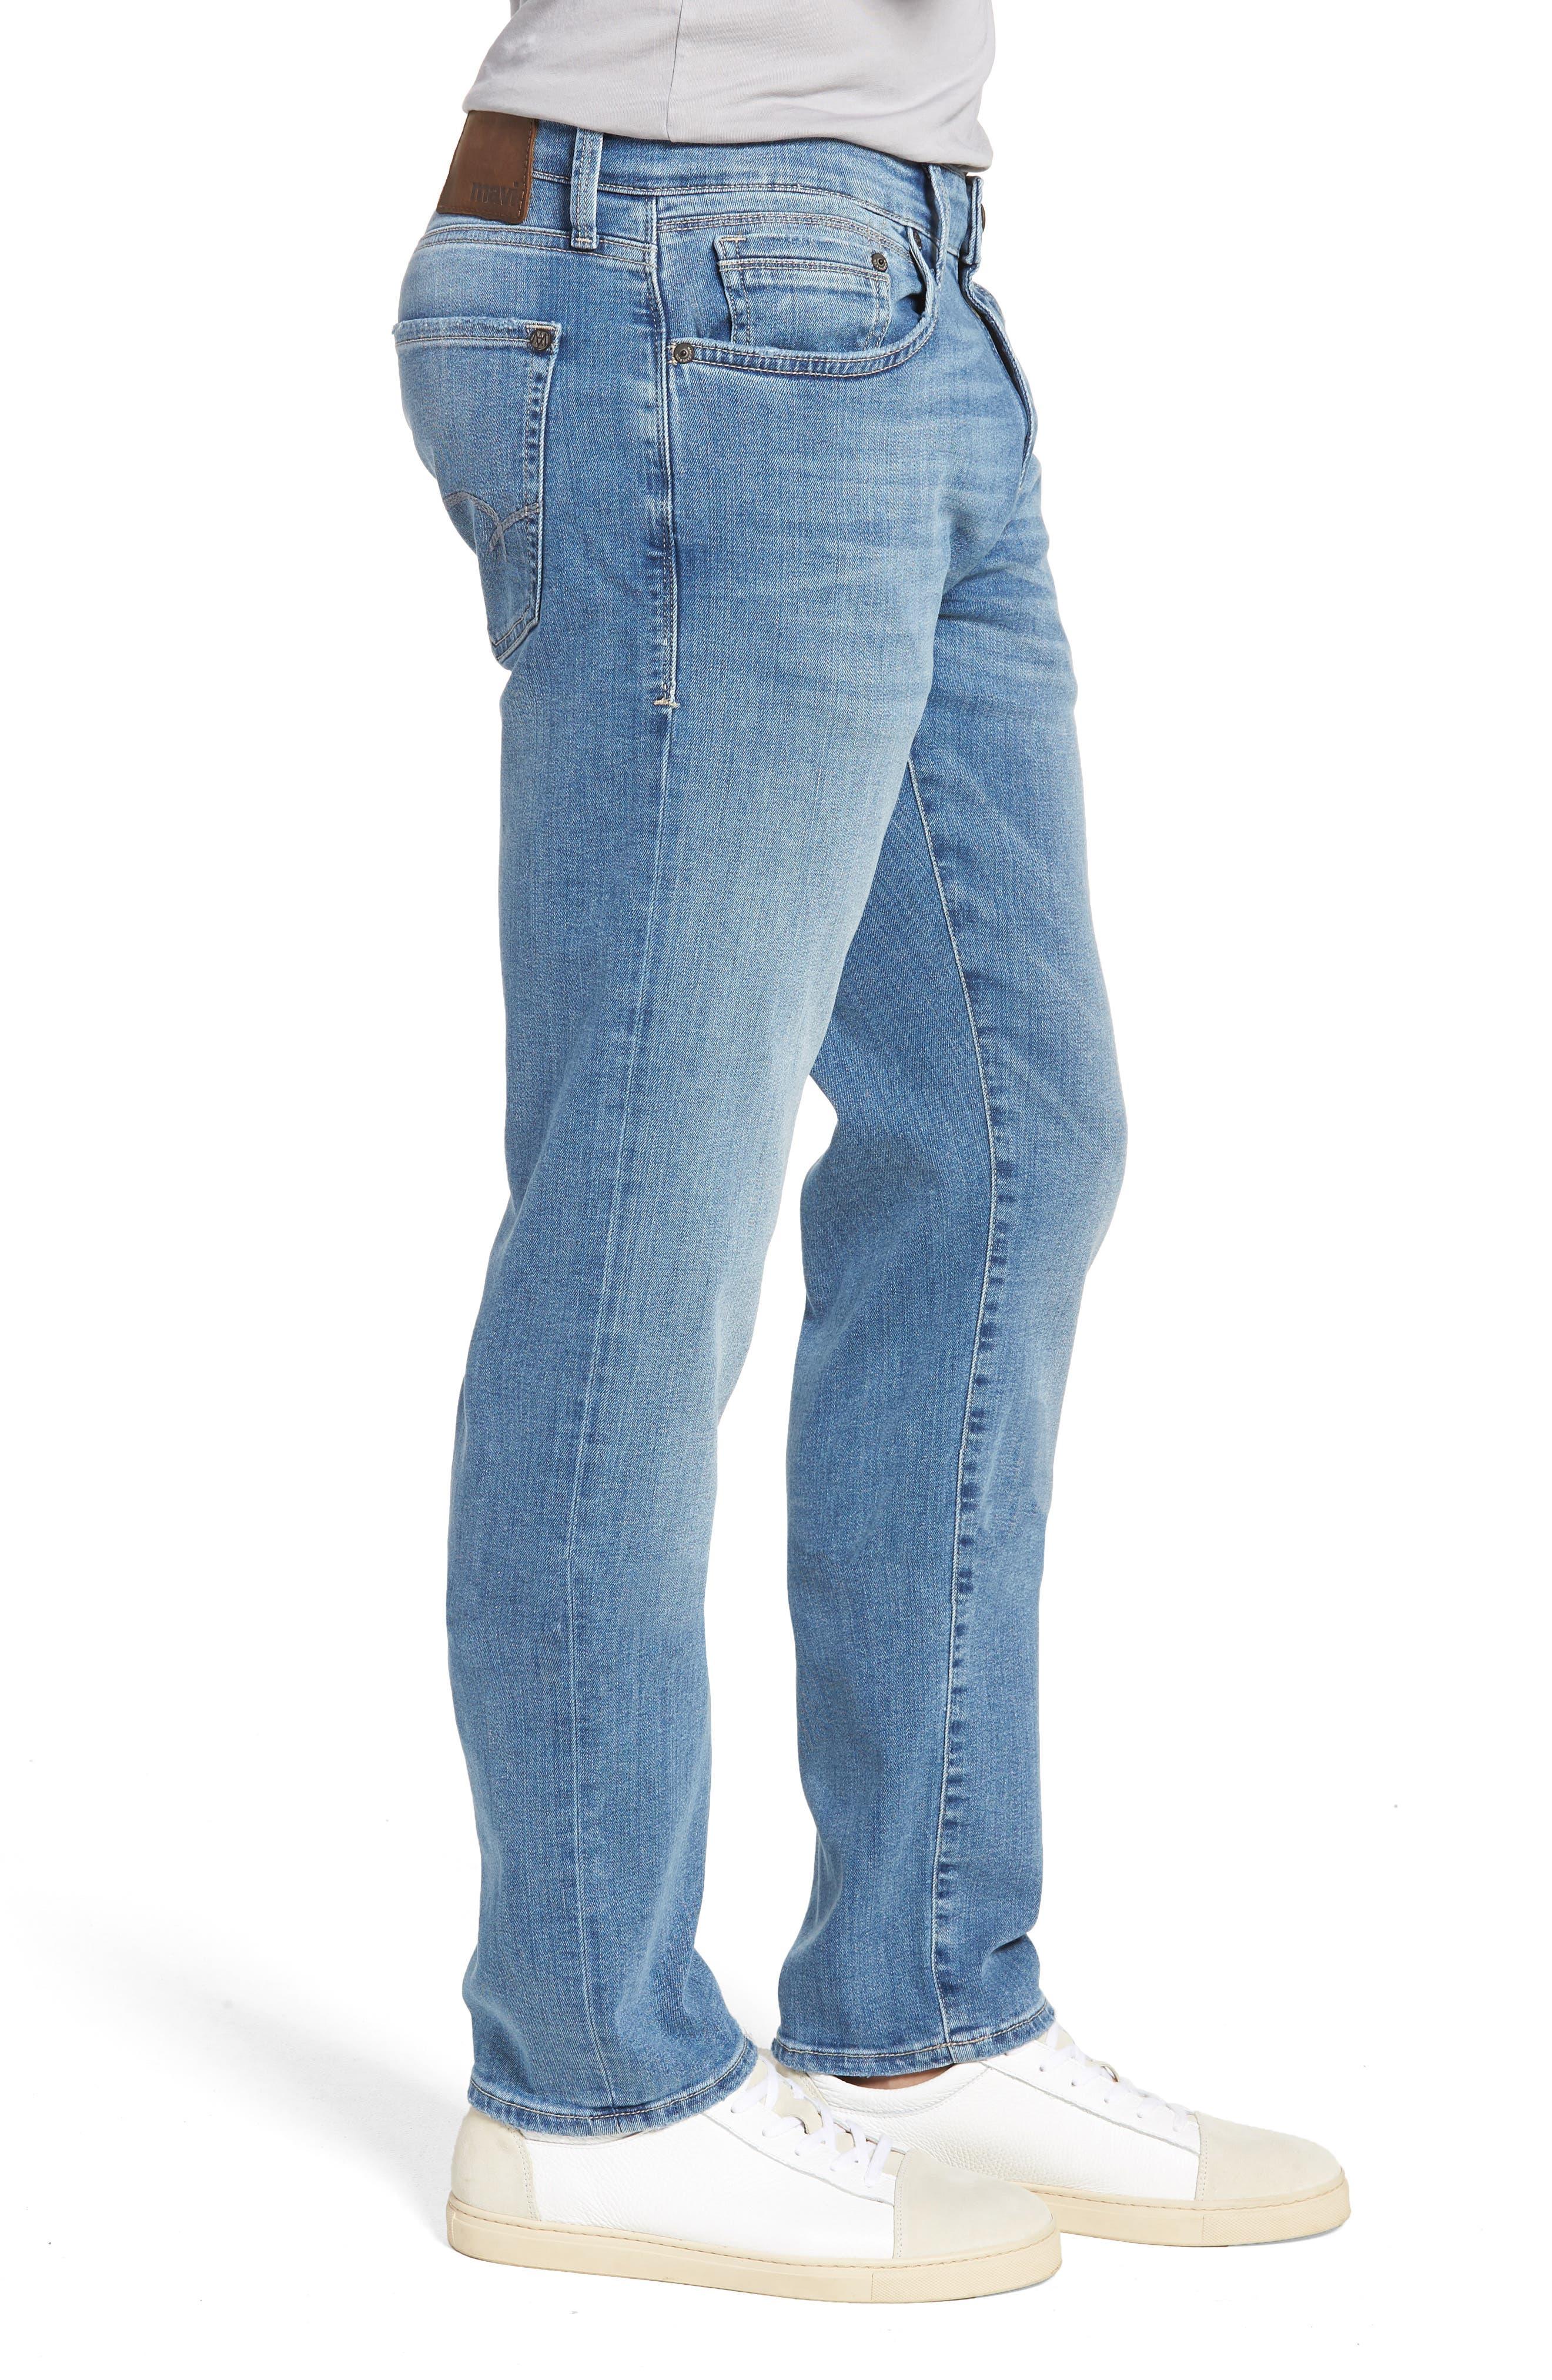 Jake Slim Fit Jeans,                             Alternate thumbnail 3, color,